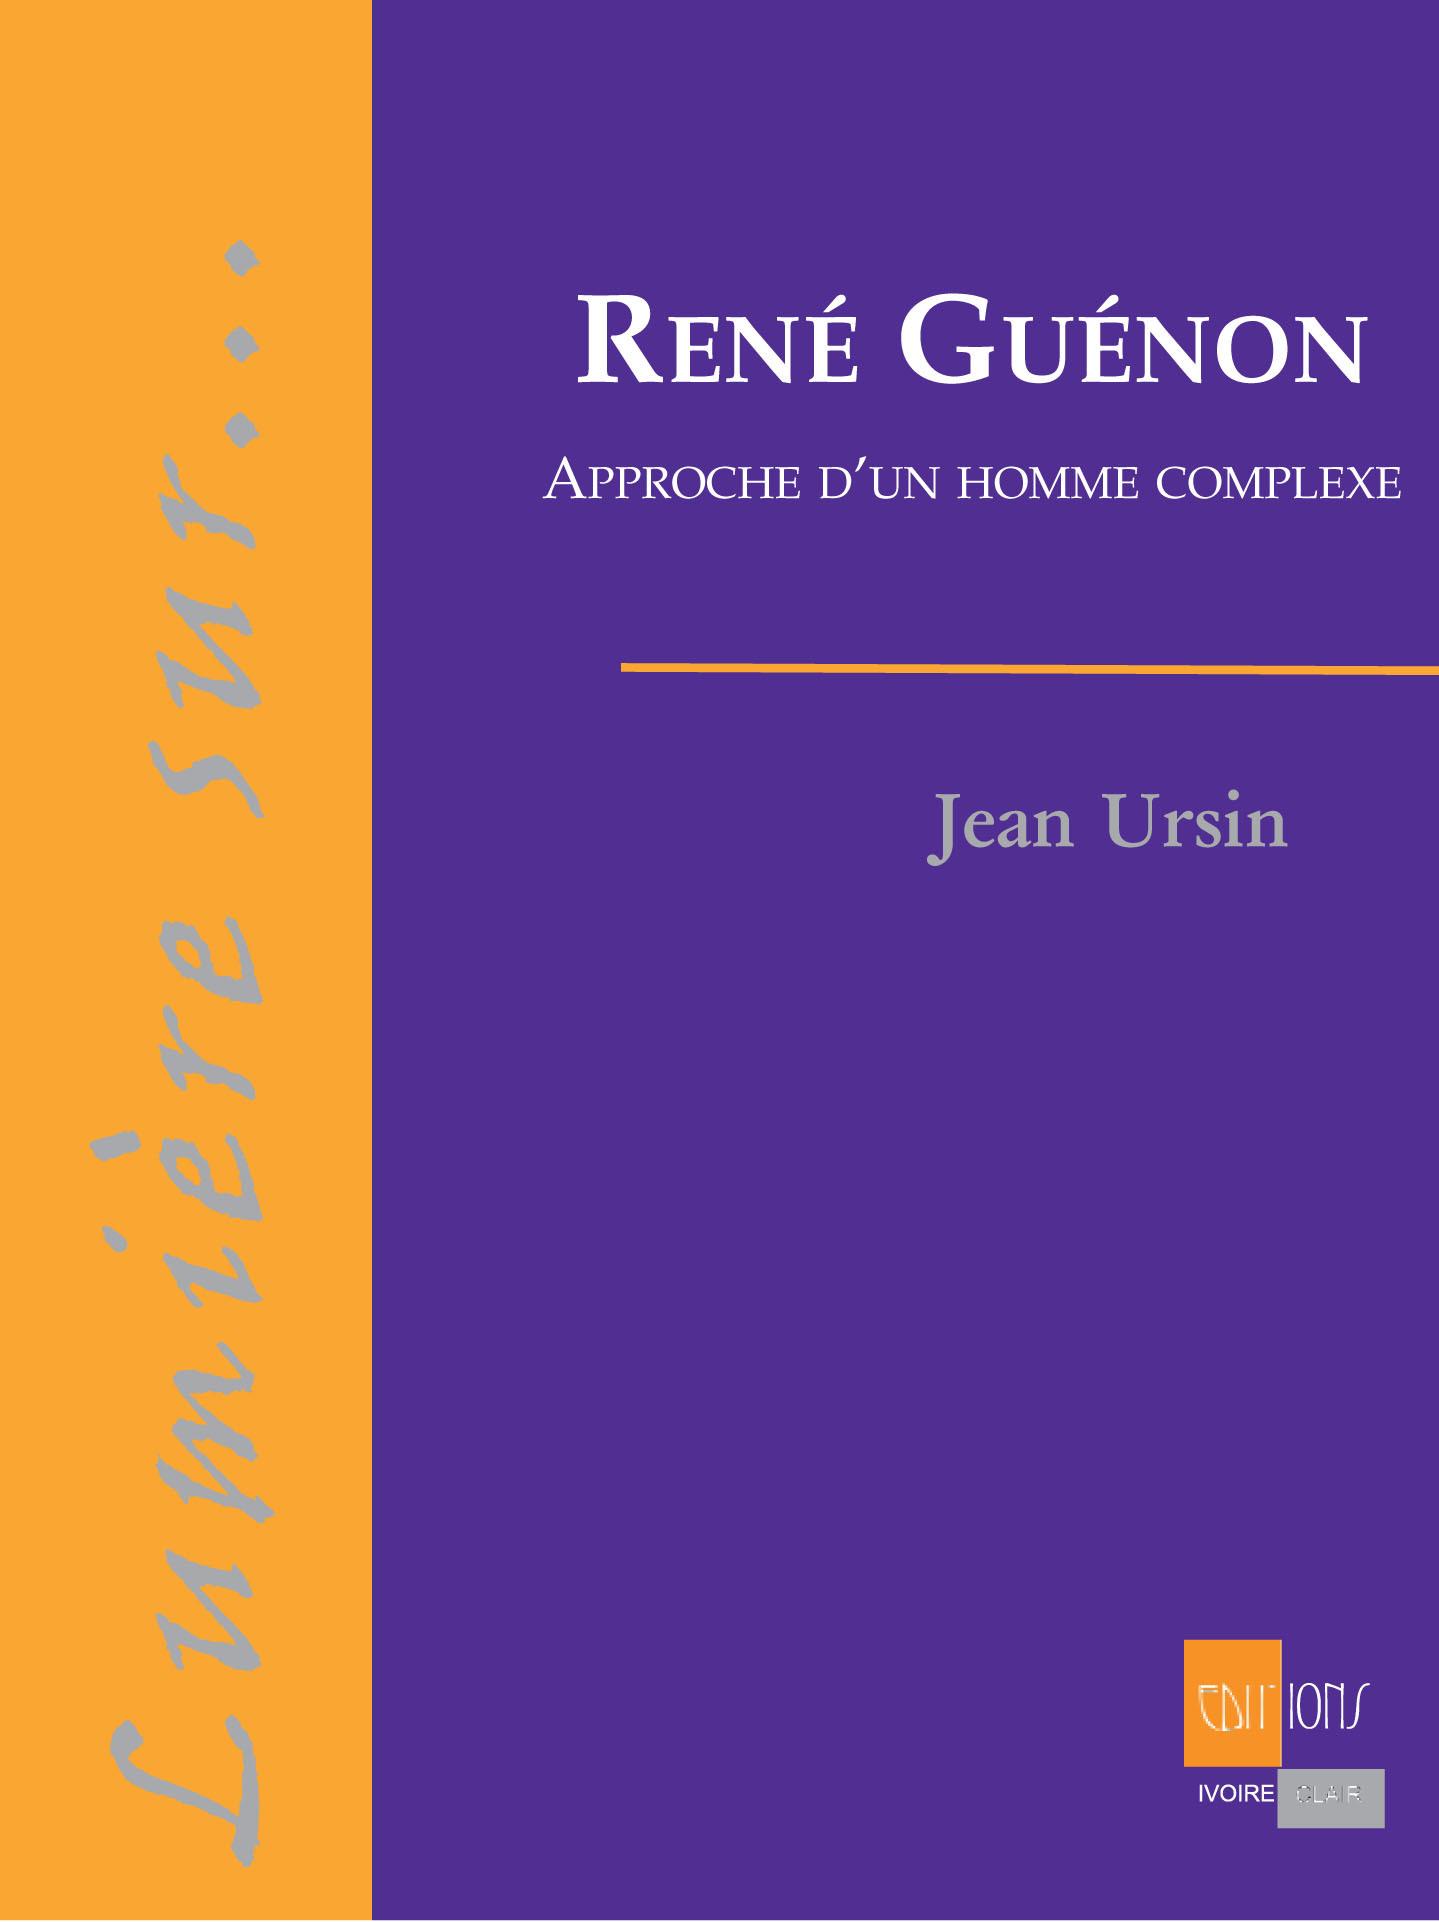 RENE GUENON - APPROCHE D'UN HOMME COMPLEXE